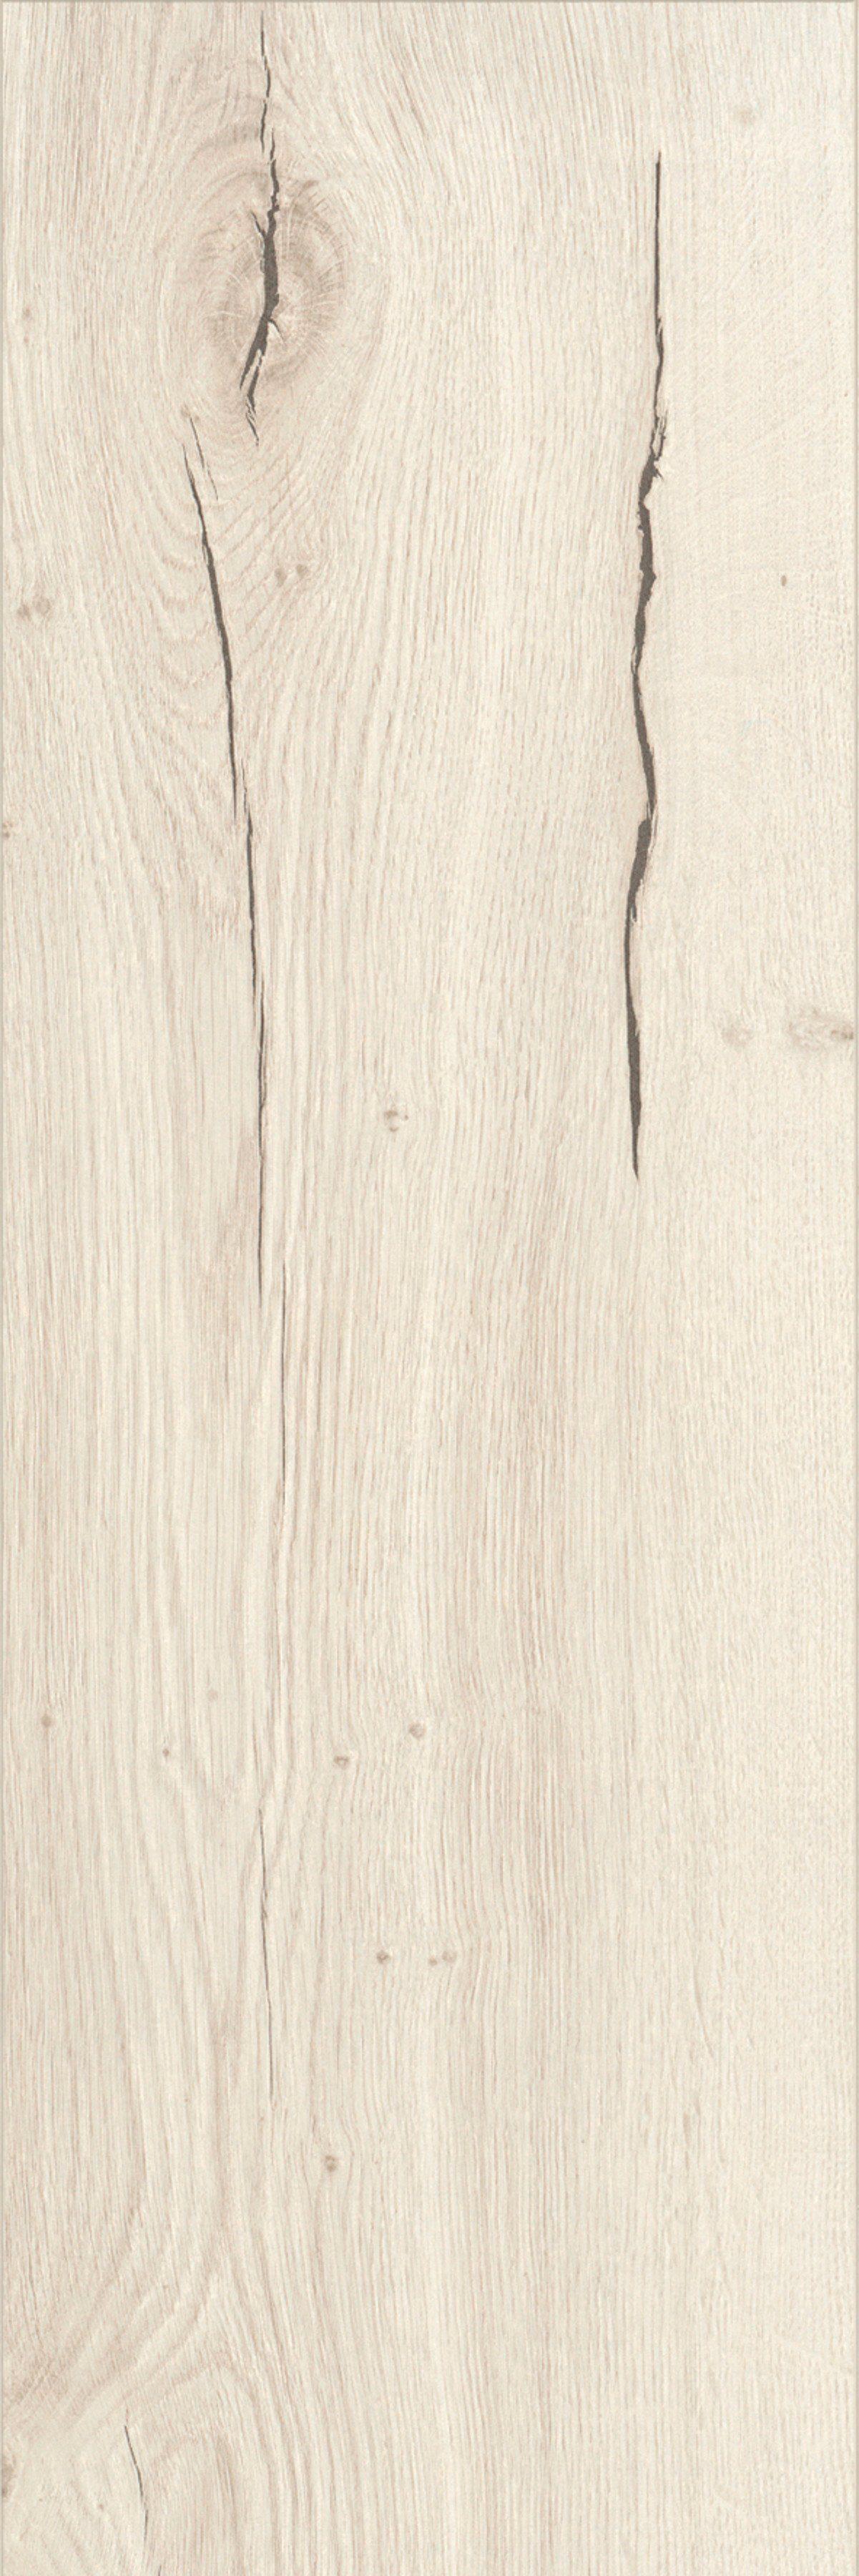 MODERNA Laminat »Variation 190 - Vintage Eiche kristall«, 1287 x 190 mm, Stärke 8 mm